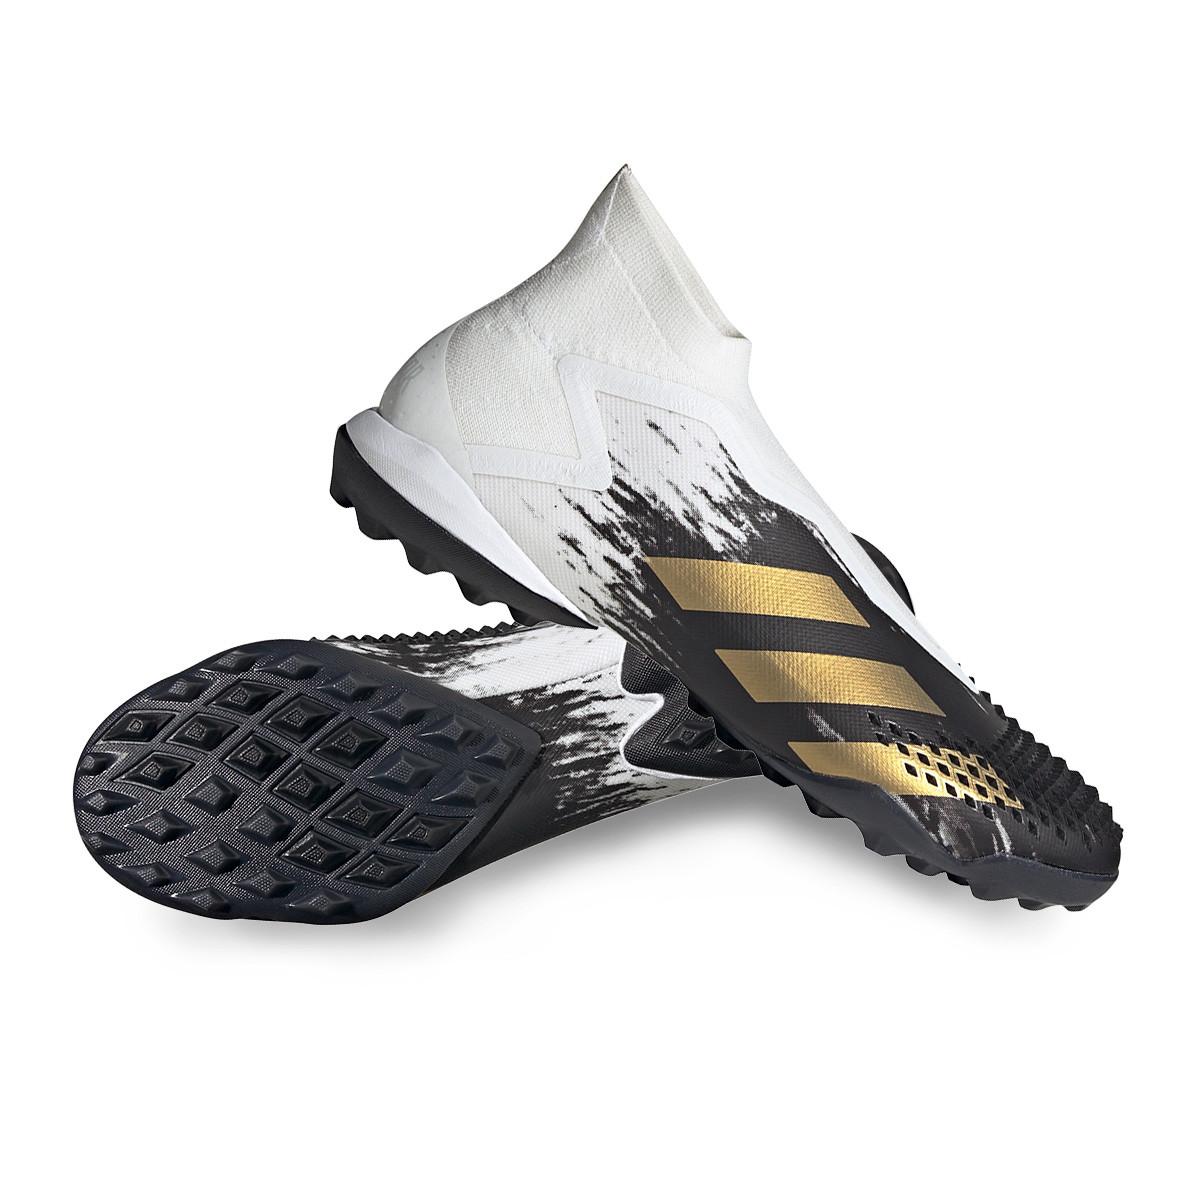 Luvas adidas Predator Pro Manuel Neuer Solar yellow Bright.